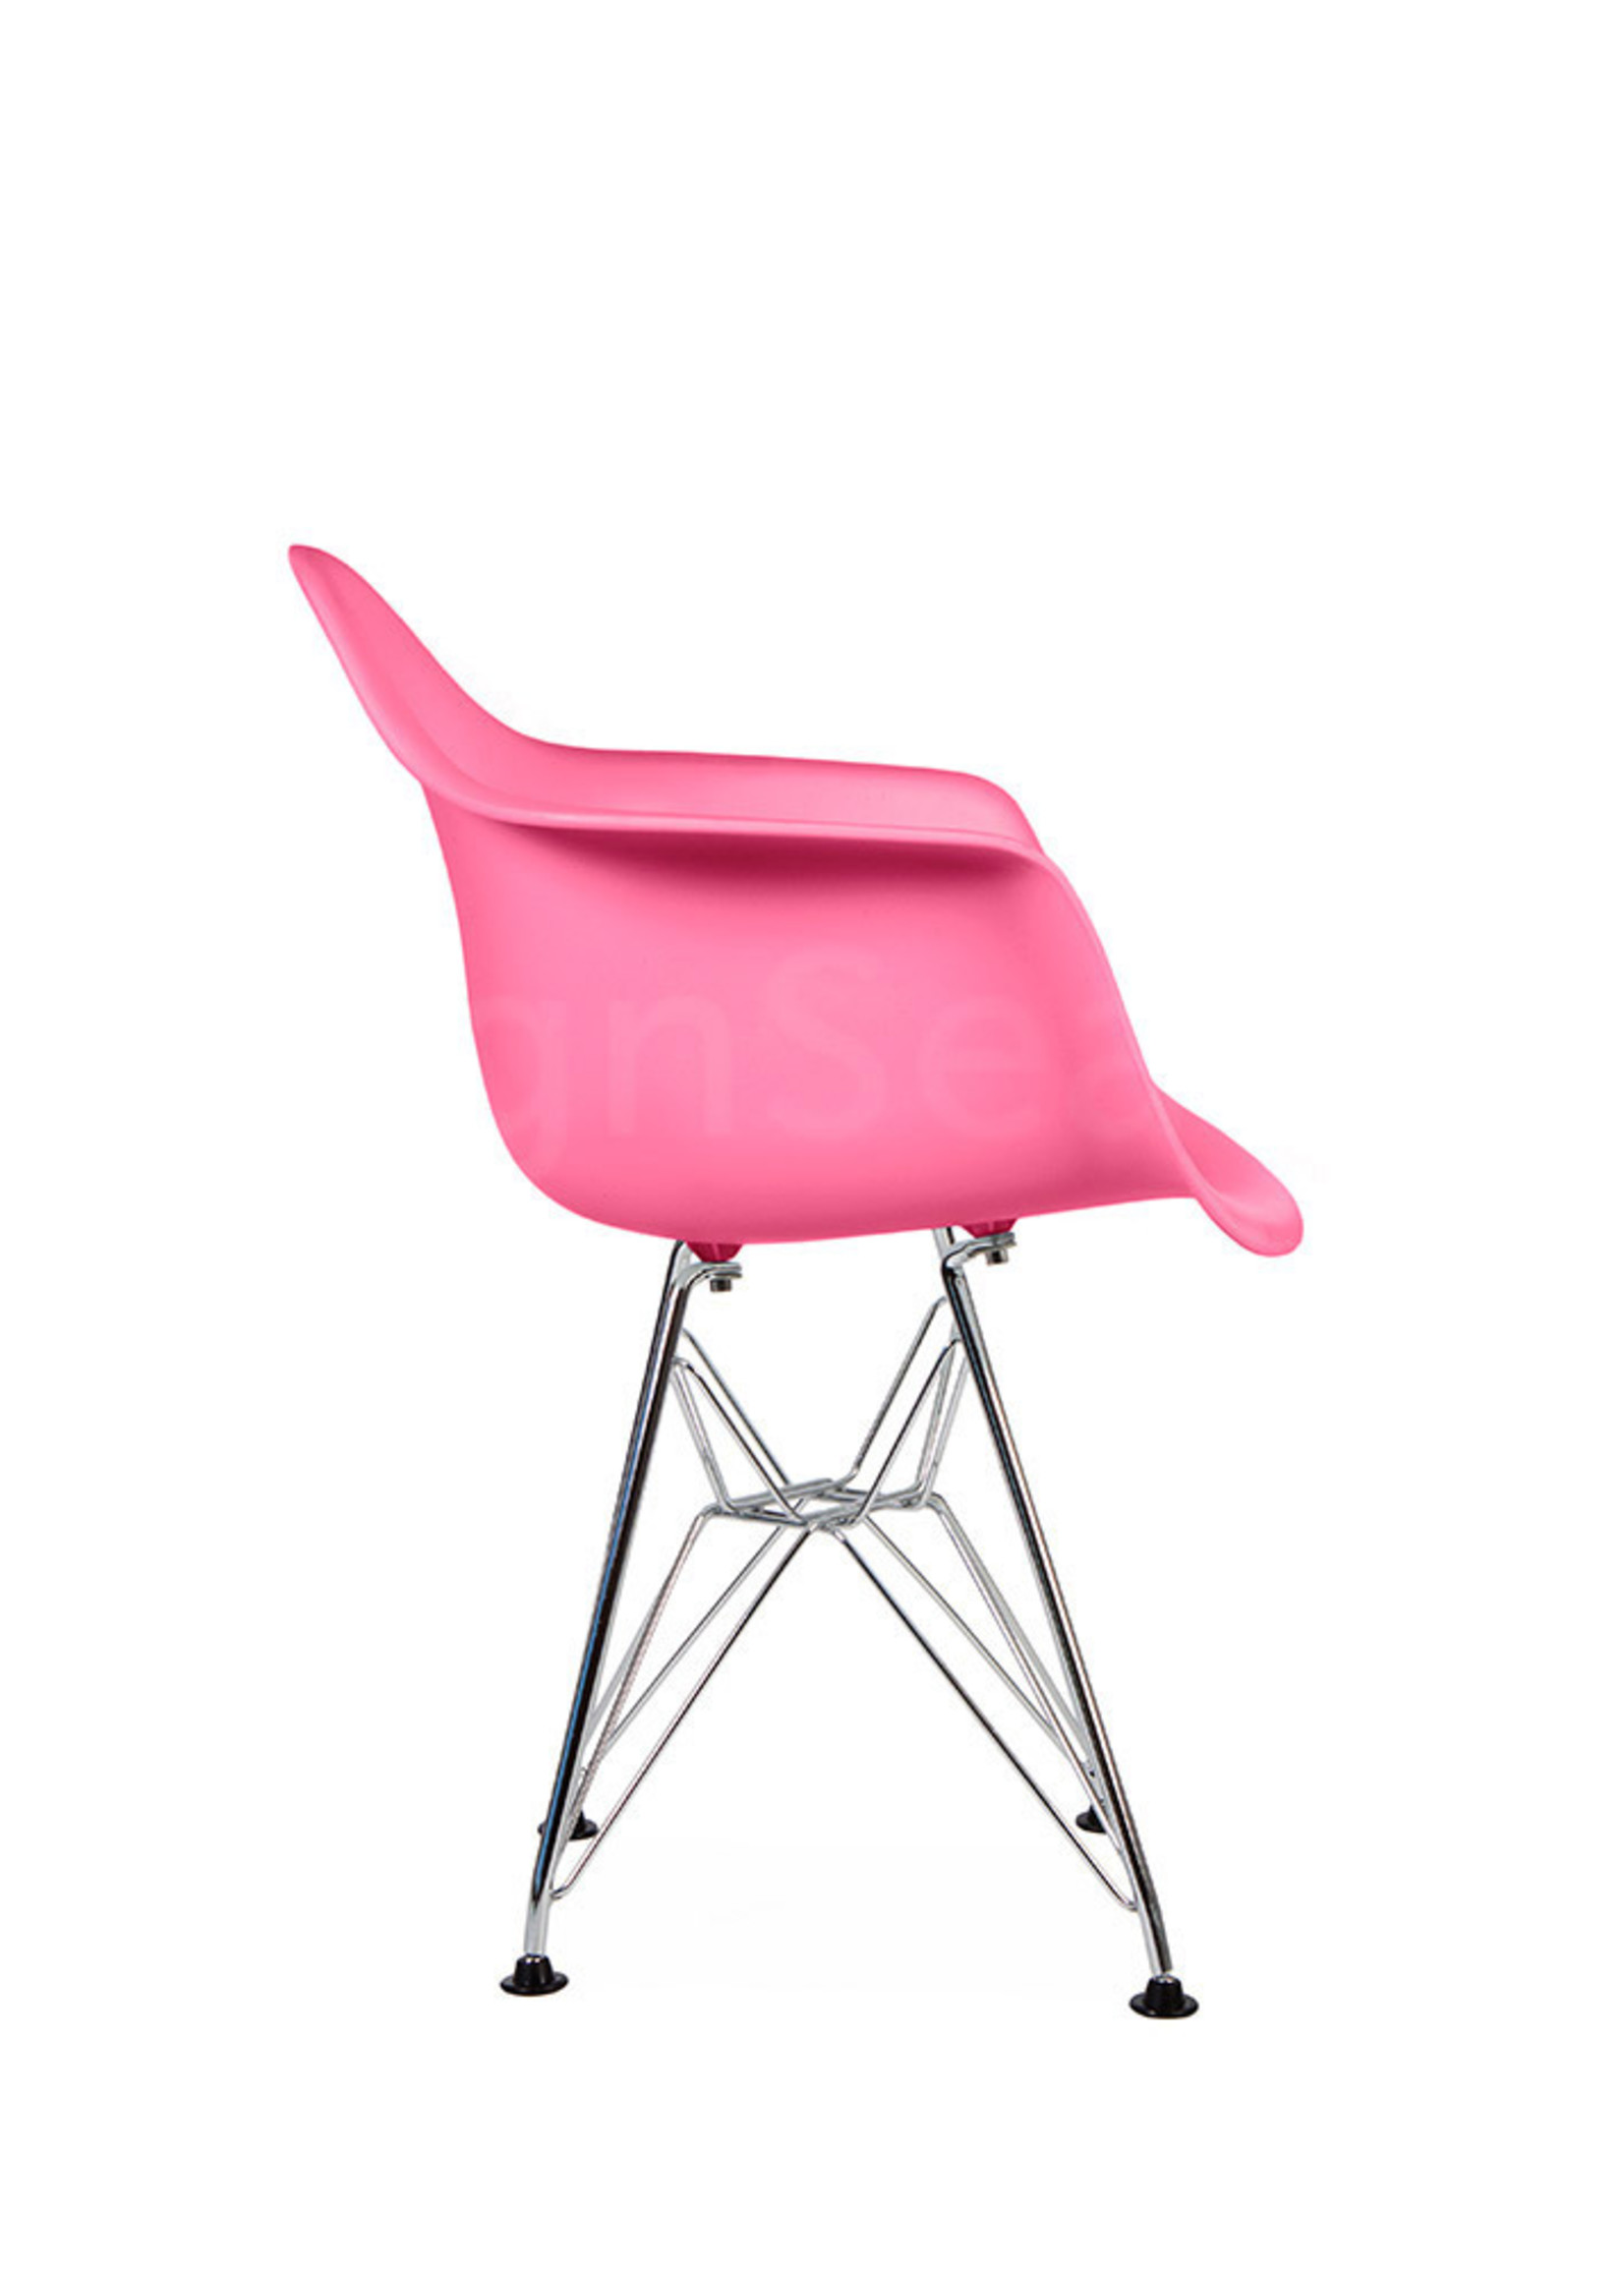 DAR Eames Design Kinderstoel Zuurstok roze